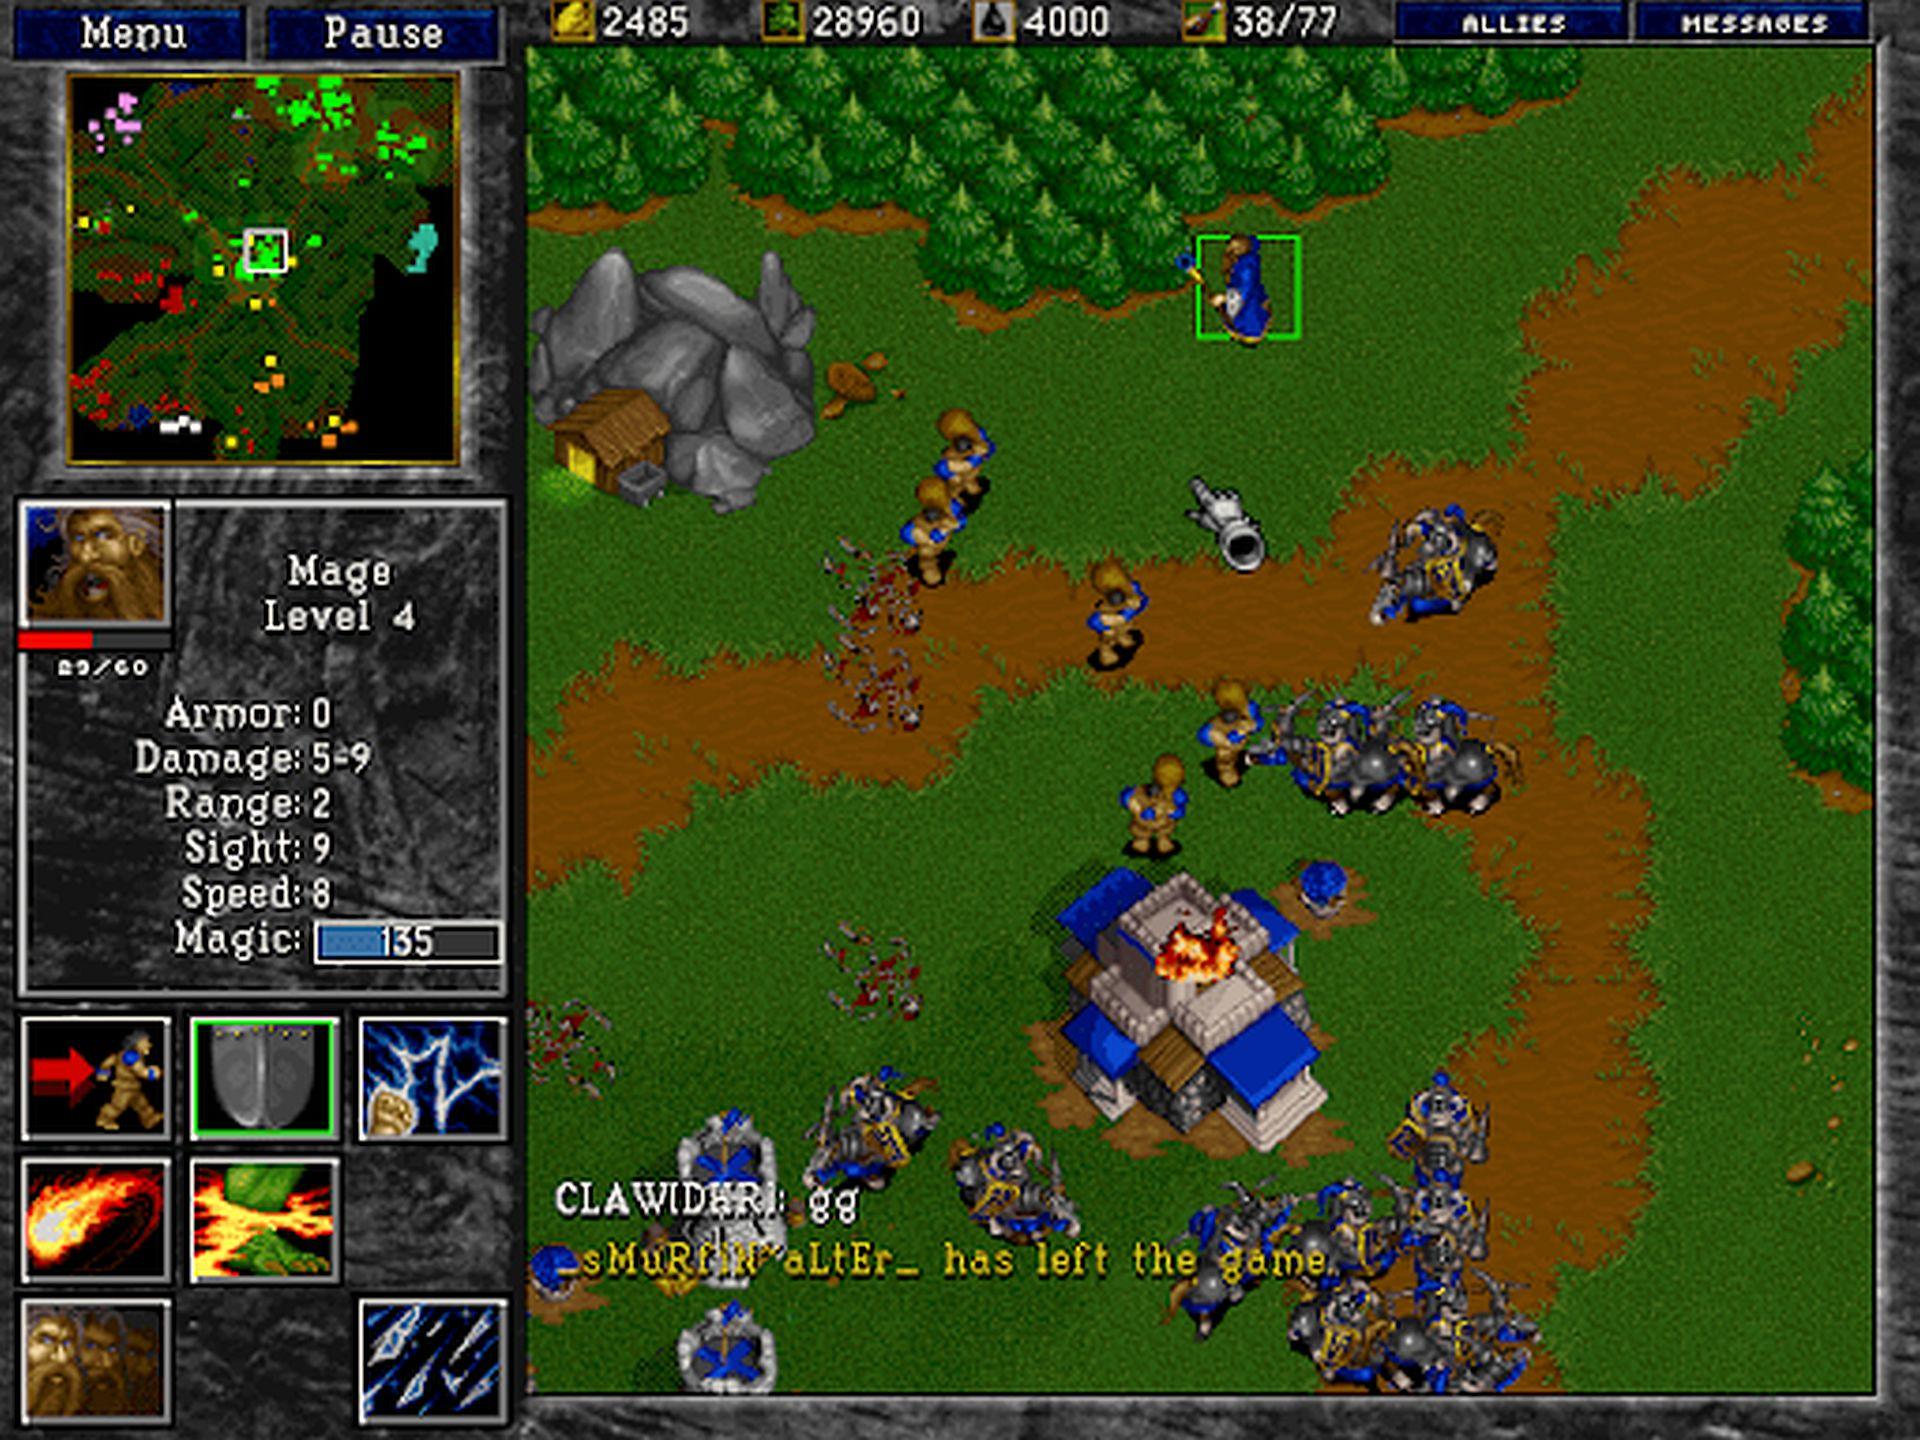 Blizzard Entertainment's WarCraft II.